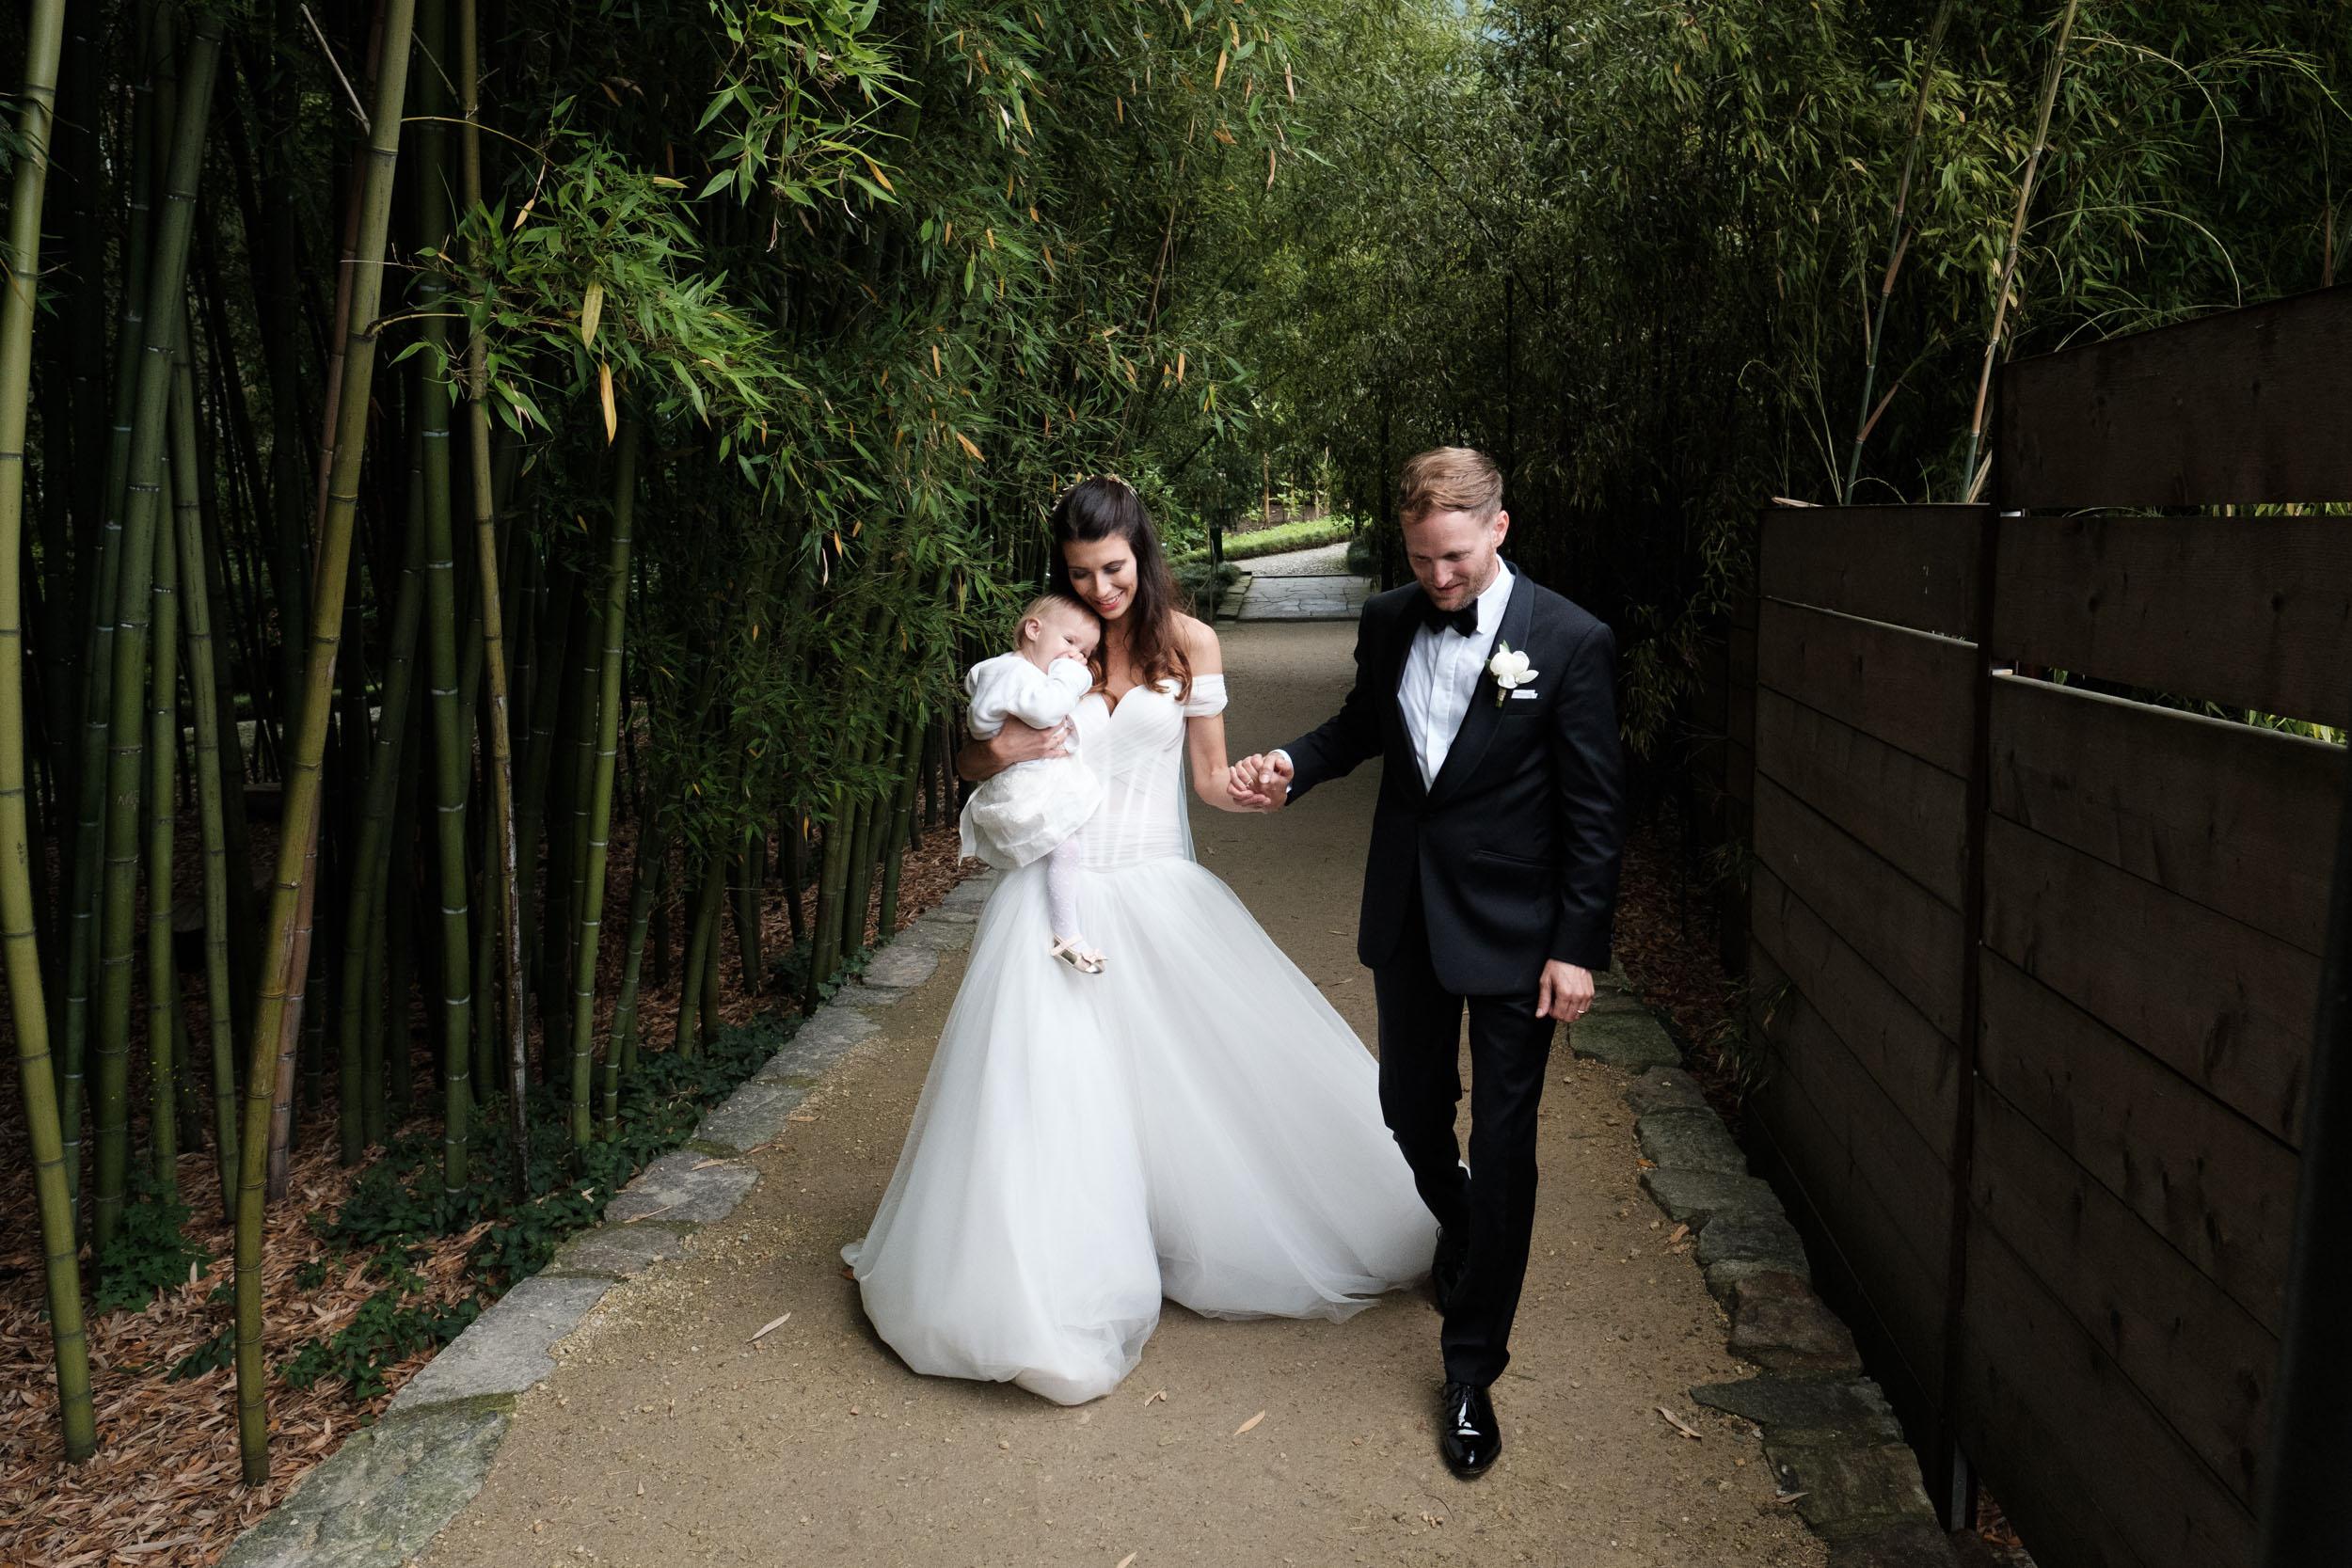 olivia-andreas-wedding-switzerland-331.jpg